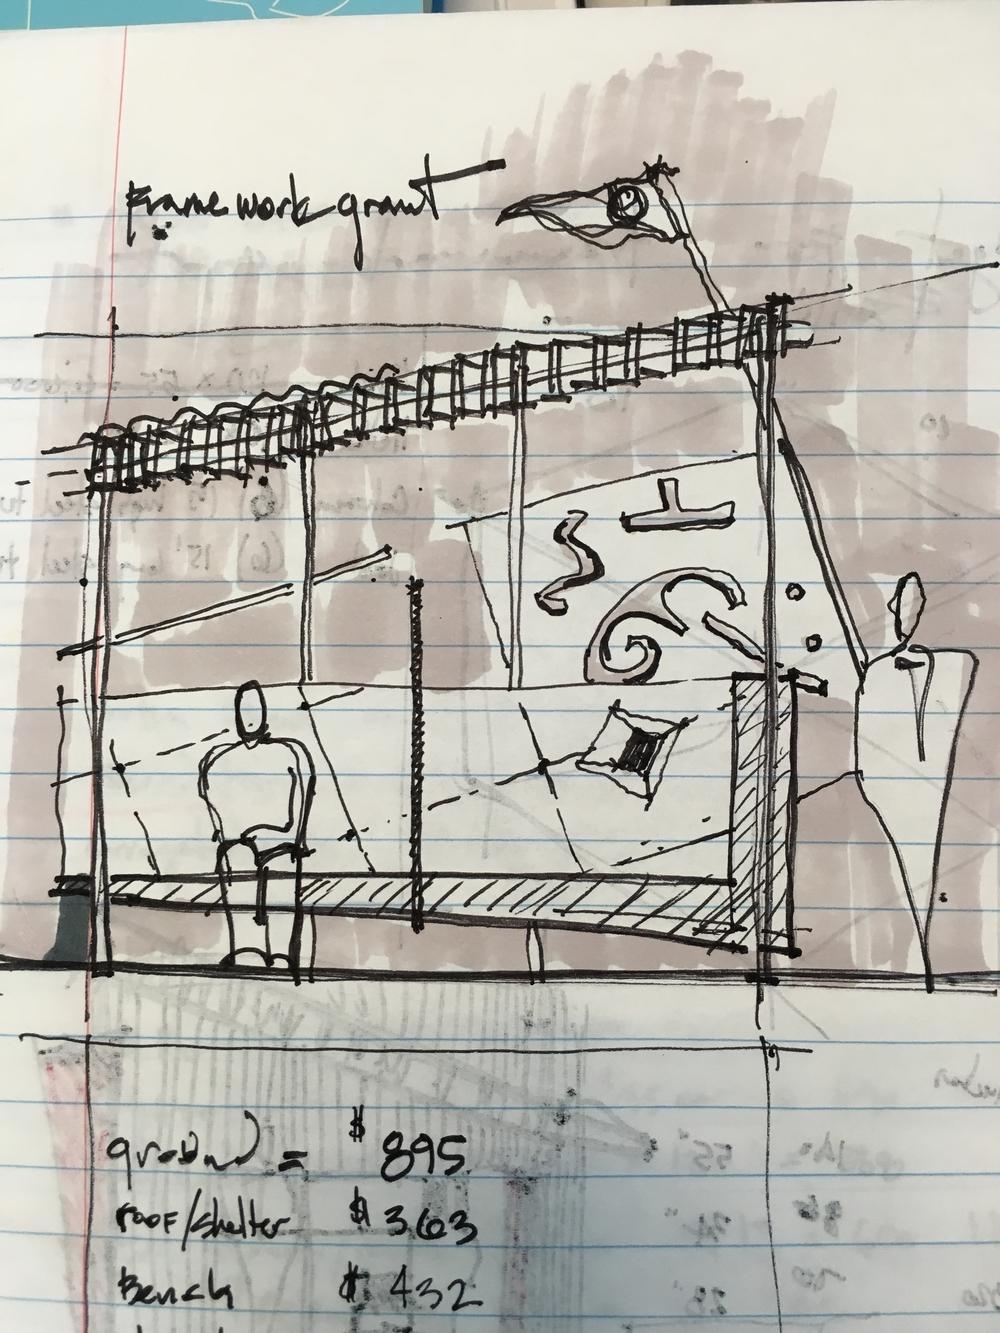 cultural landmarking notes